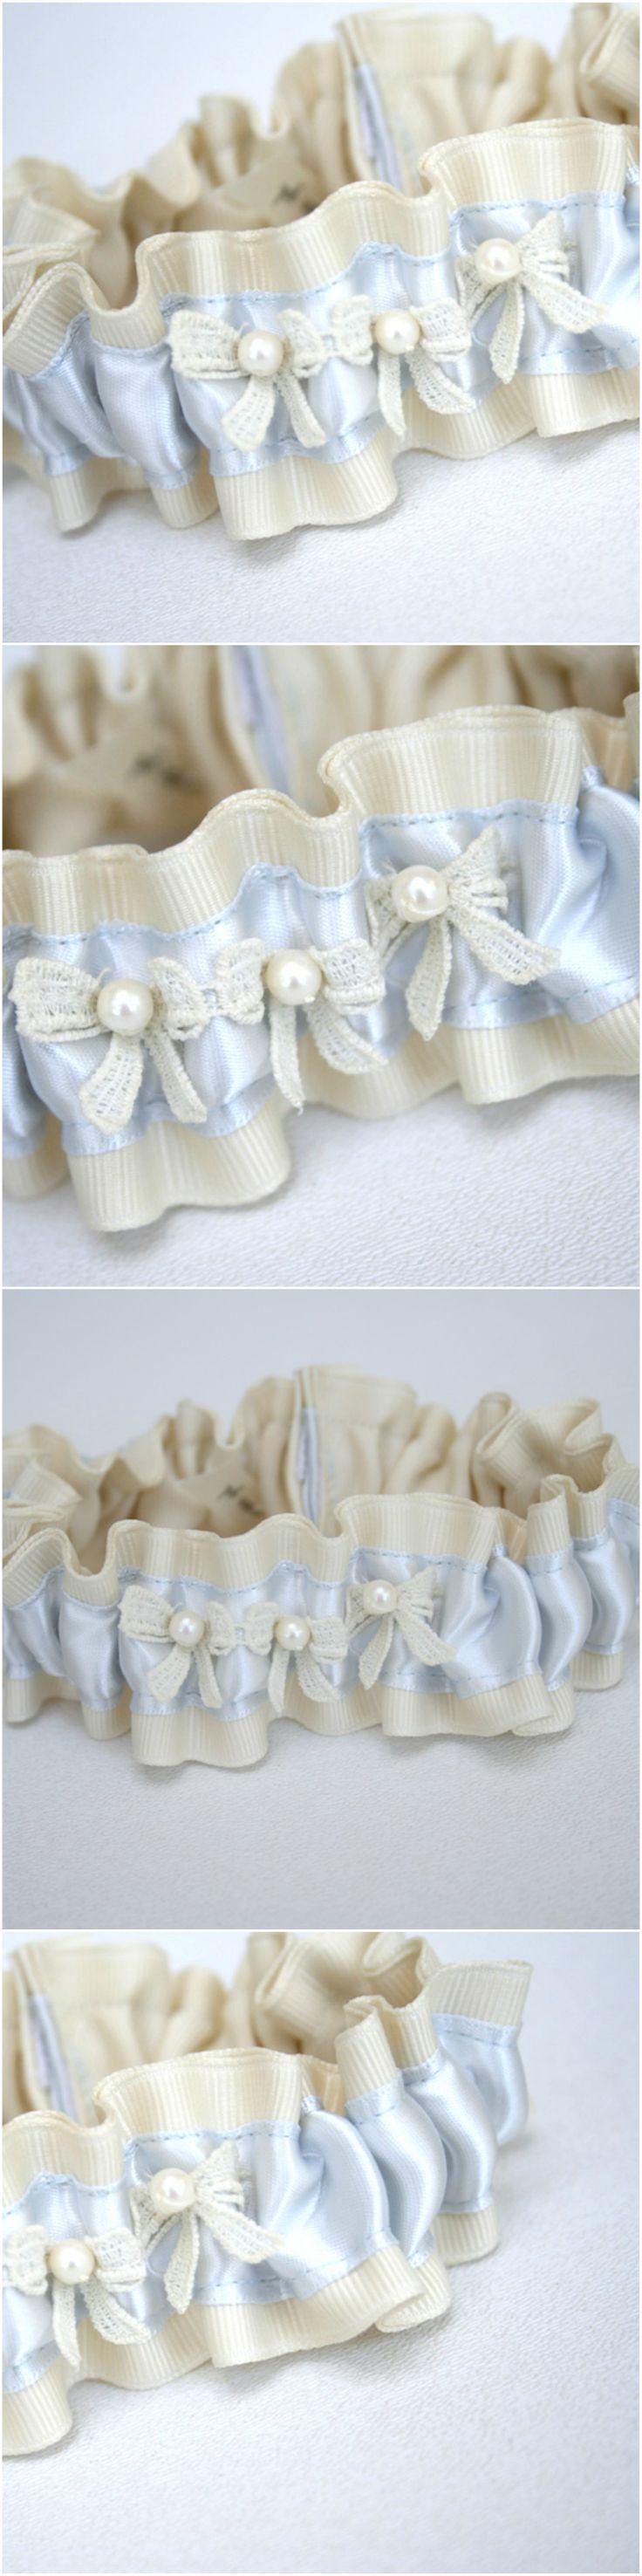 Custom Ivory Pearls with Light Blue Reused Wedding Dress Bridal Garter-by The Garter Girl